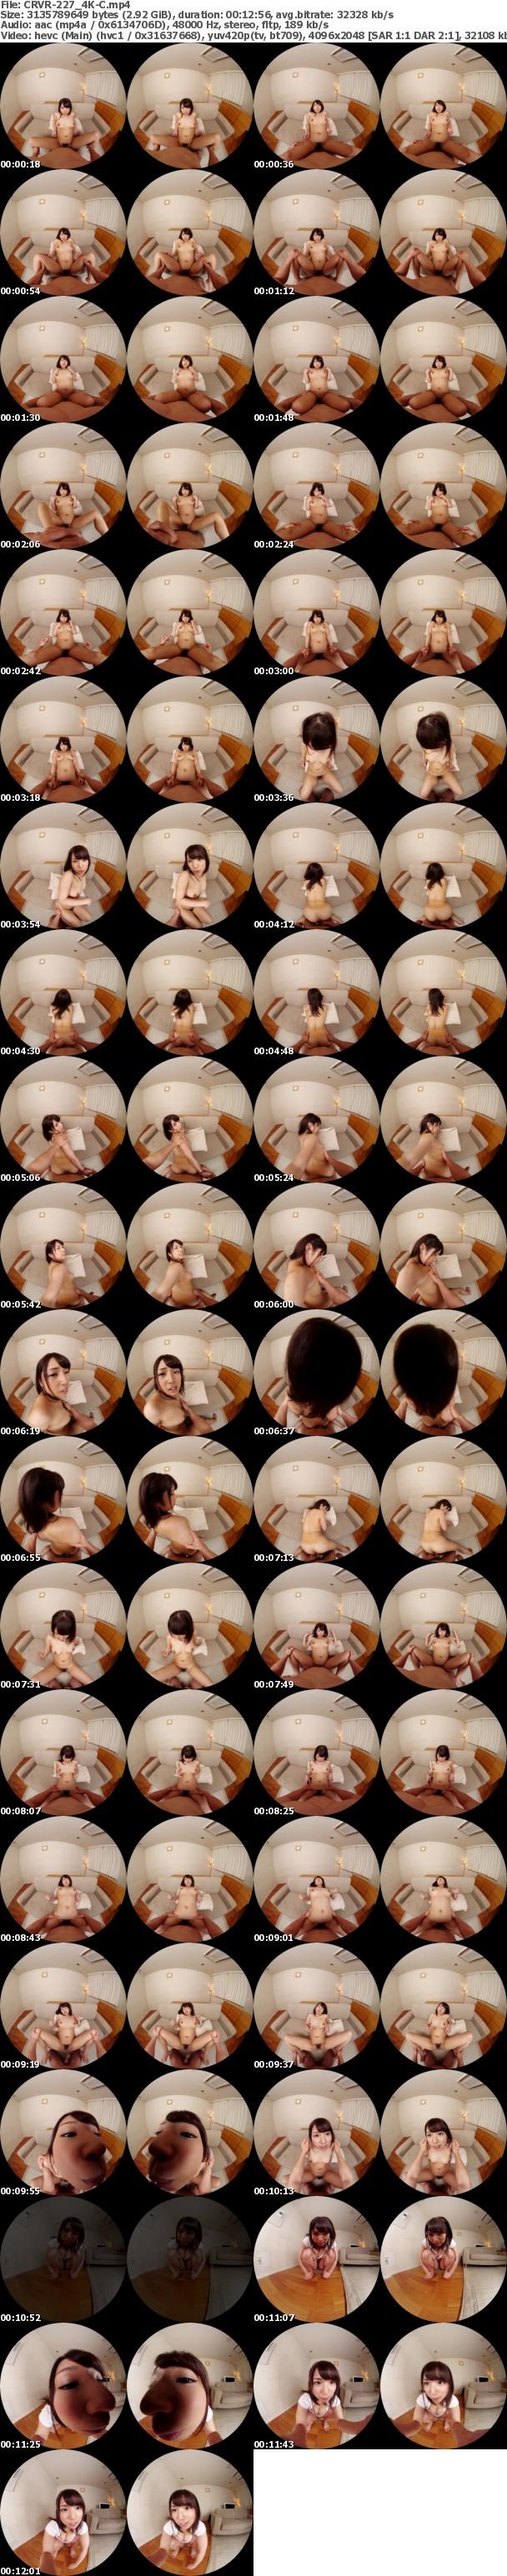 (VR) (4K) CRVR-227 柊るい うたた寝カノジョにこっそりいたずら…「目が覚めた時…目の前に好きな人がいるっていいね」小柄で巨乳なムチムチ彼女といちゃいちゃ中出しエッチ!